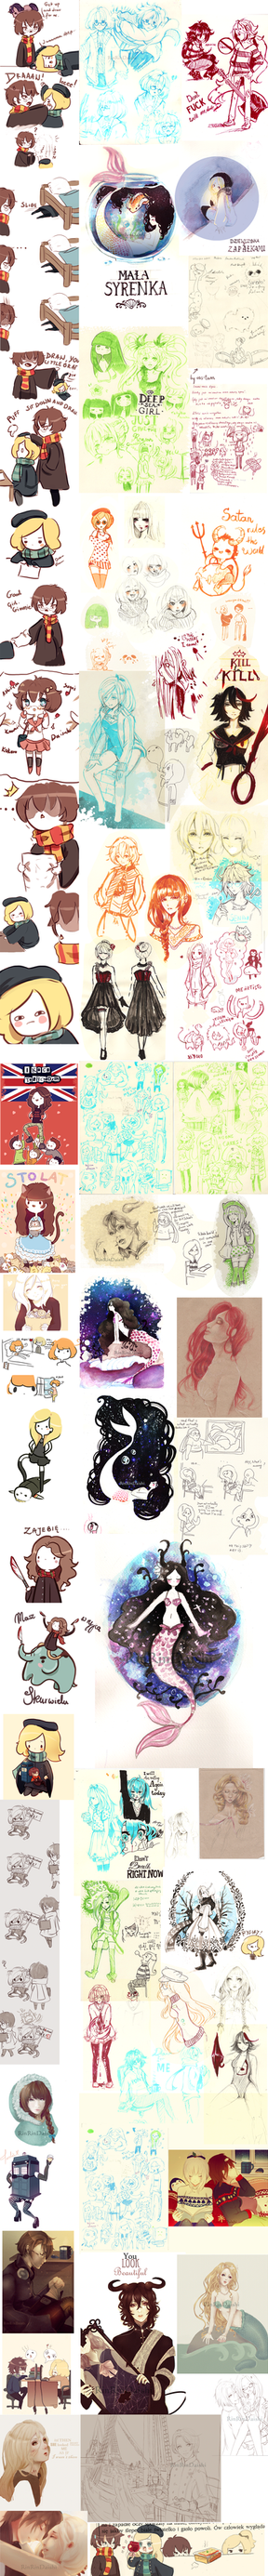 Sketch Dump5675476 by RinRinDaishi